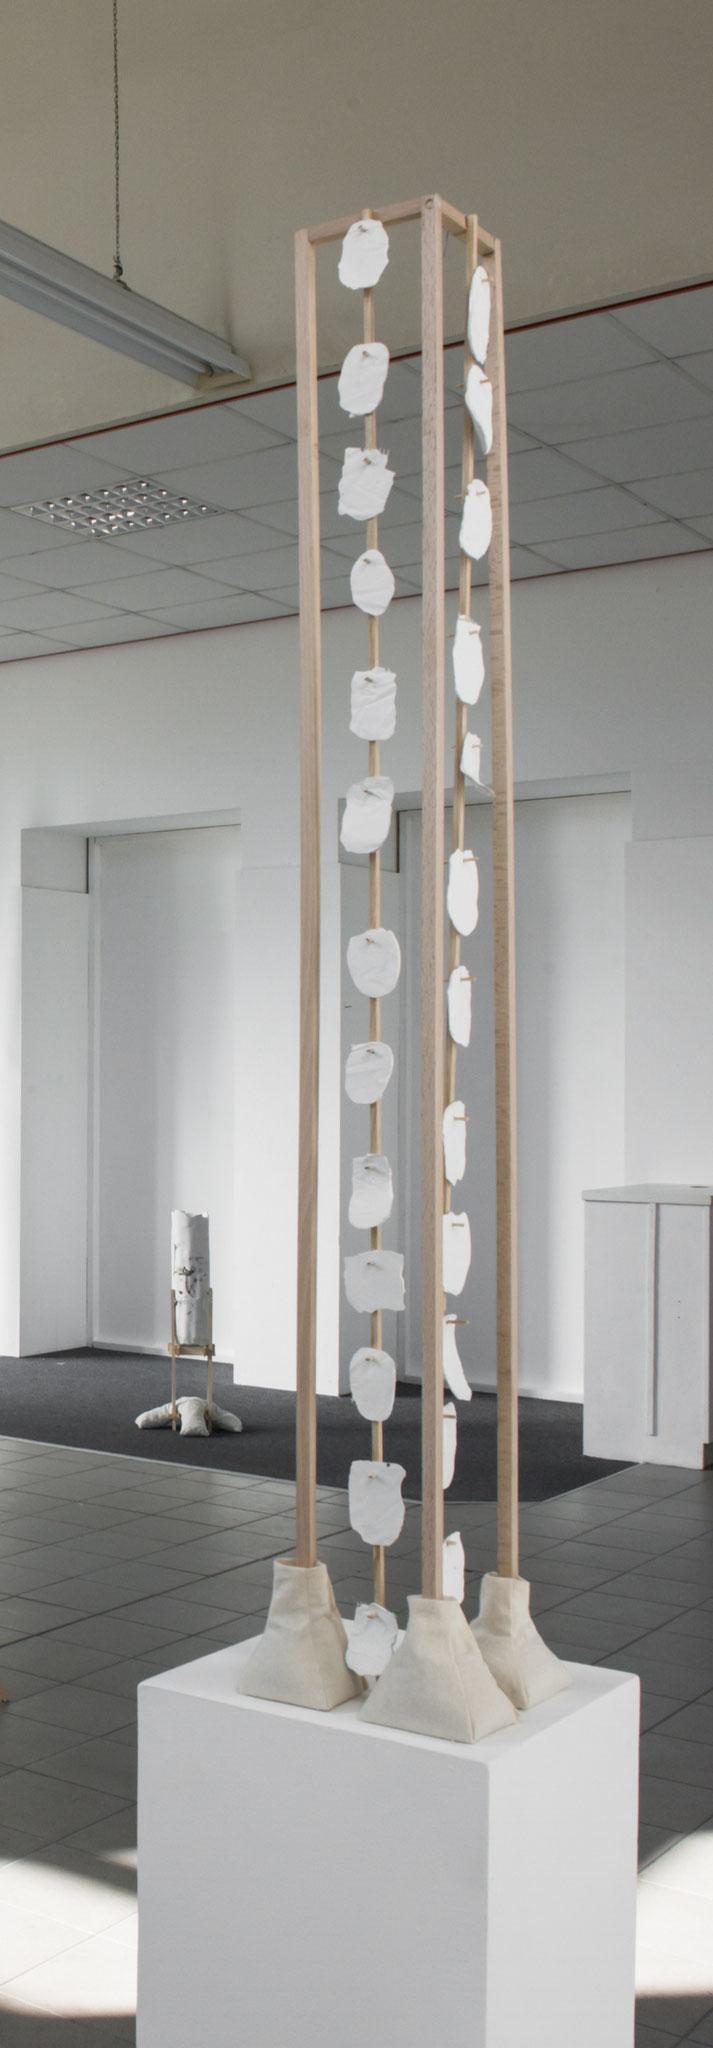 Ornament_Holz, Zement, Stoff, Sand_95 x 20 x 20 cm_2018_Foto: Gabi Rottes